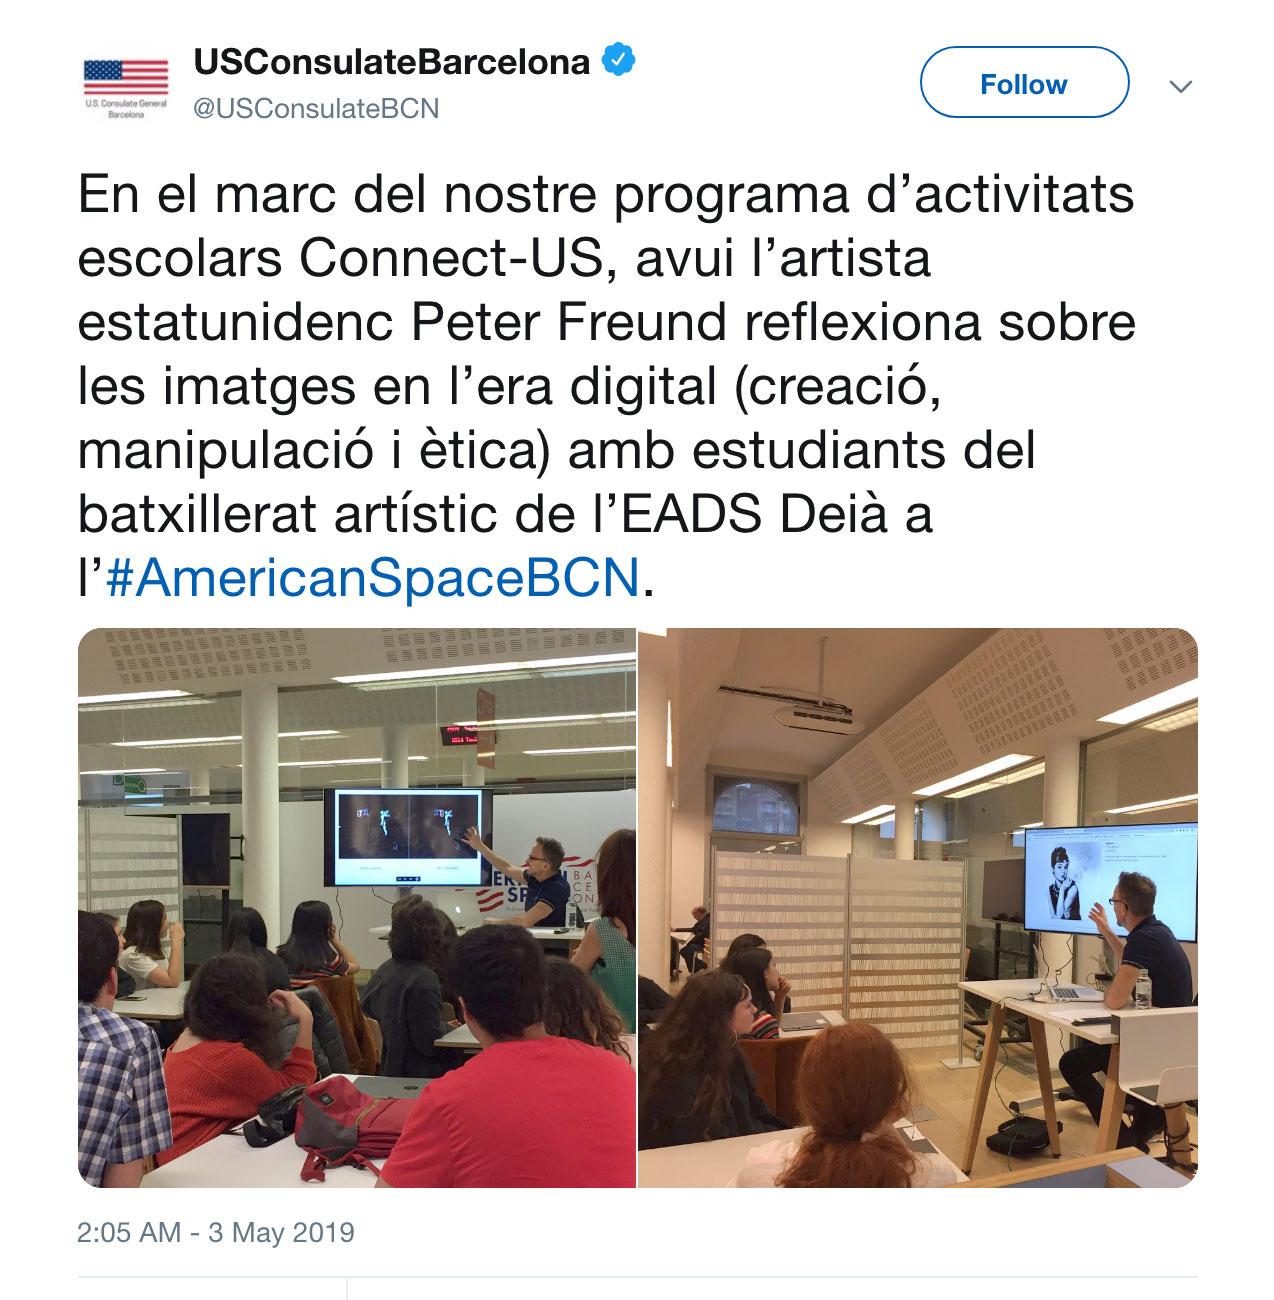 Fig. 3 U.S. Consulate tweet.